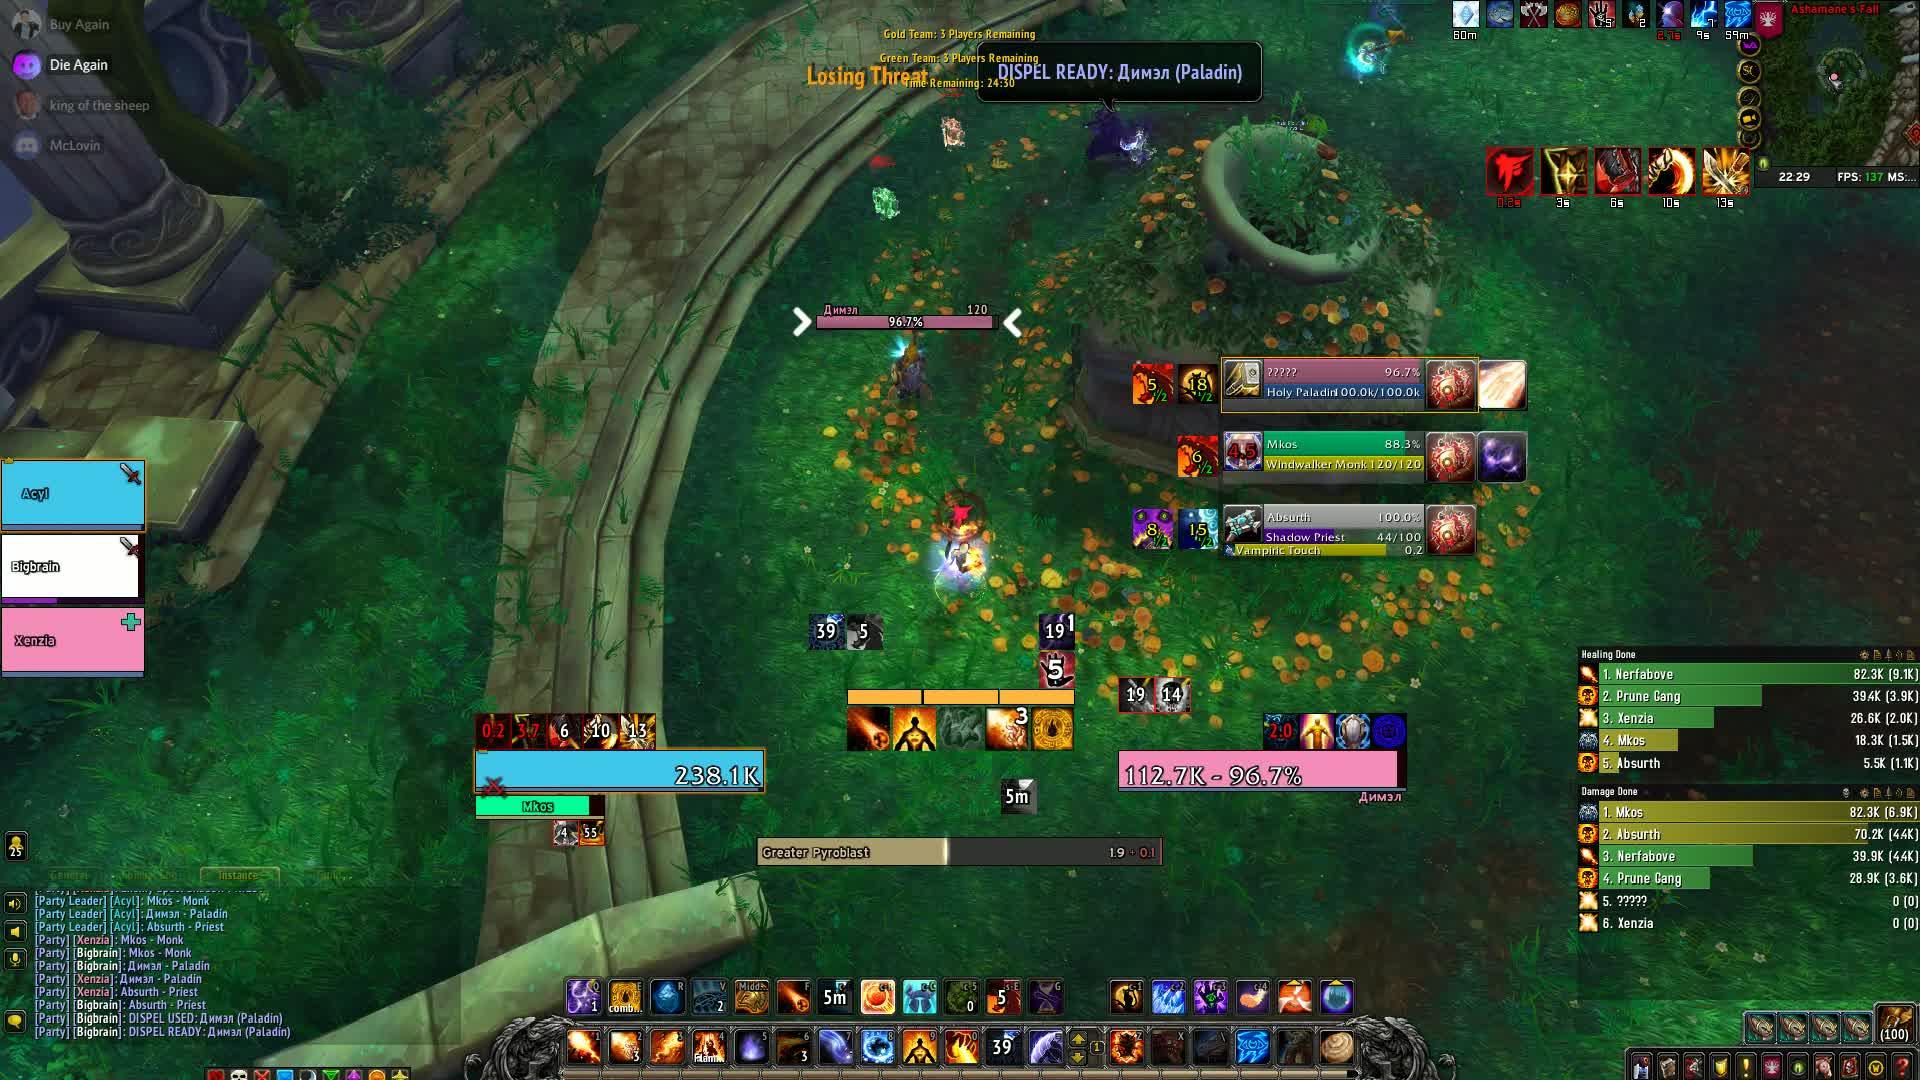 worldofwarcraft, World Of Warcraft 2019.04.18 - 22.30.17.07.DVR GIFs